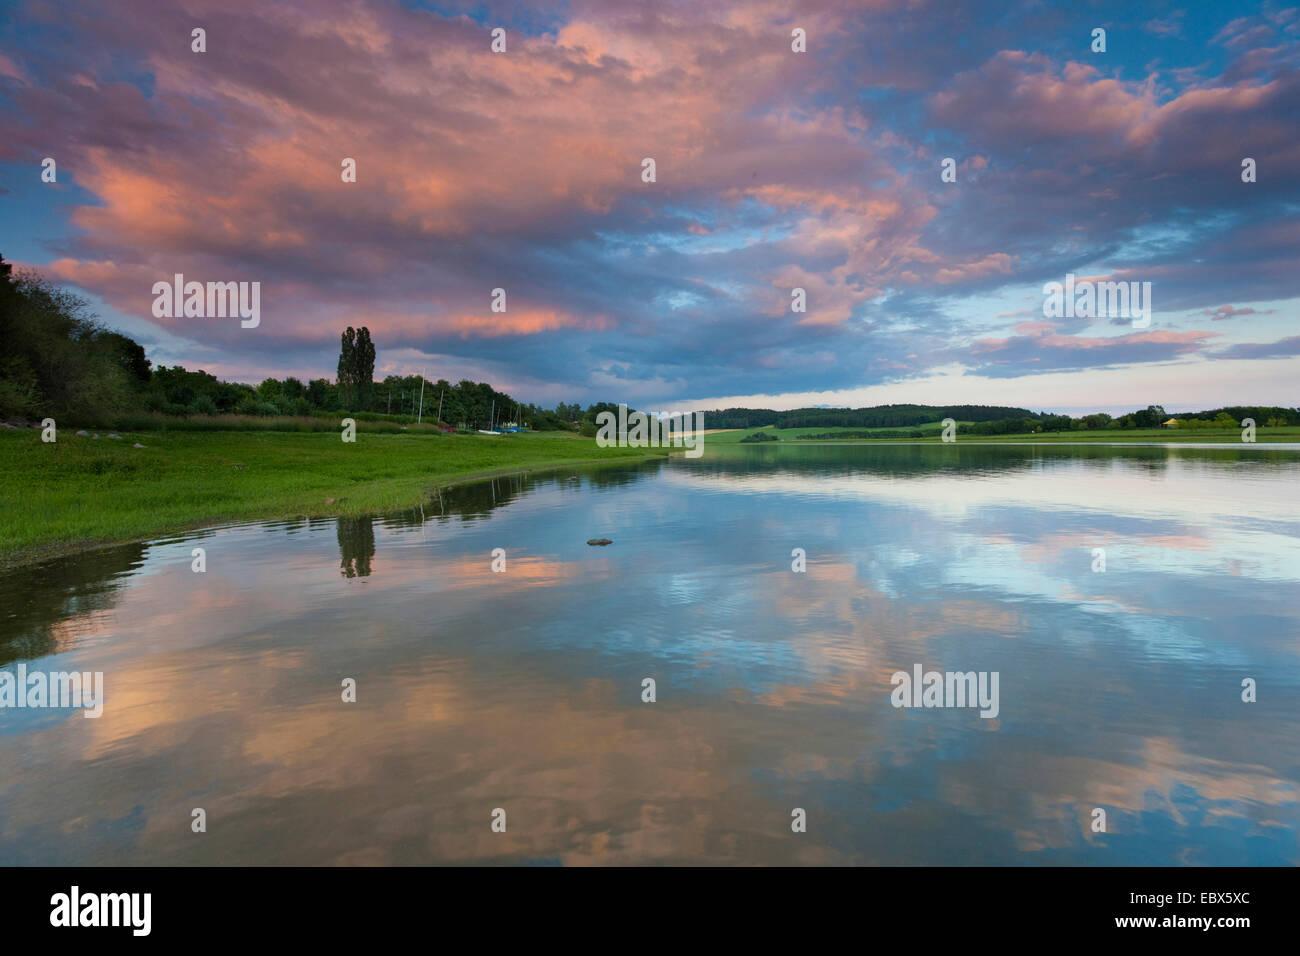 dawning over a storage lake, Germany, Saxony, Vogtlaendische Schweiz - Stock Image